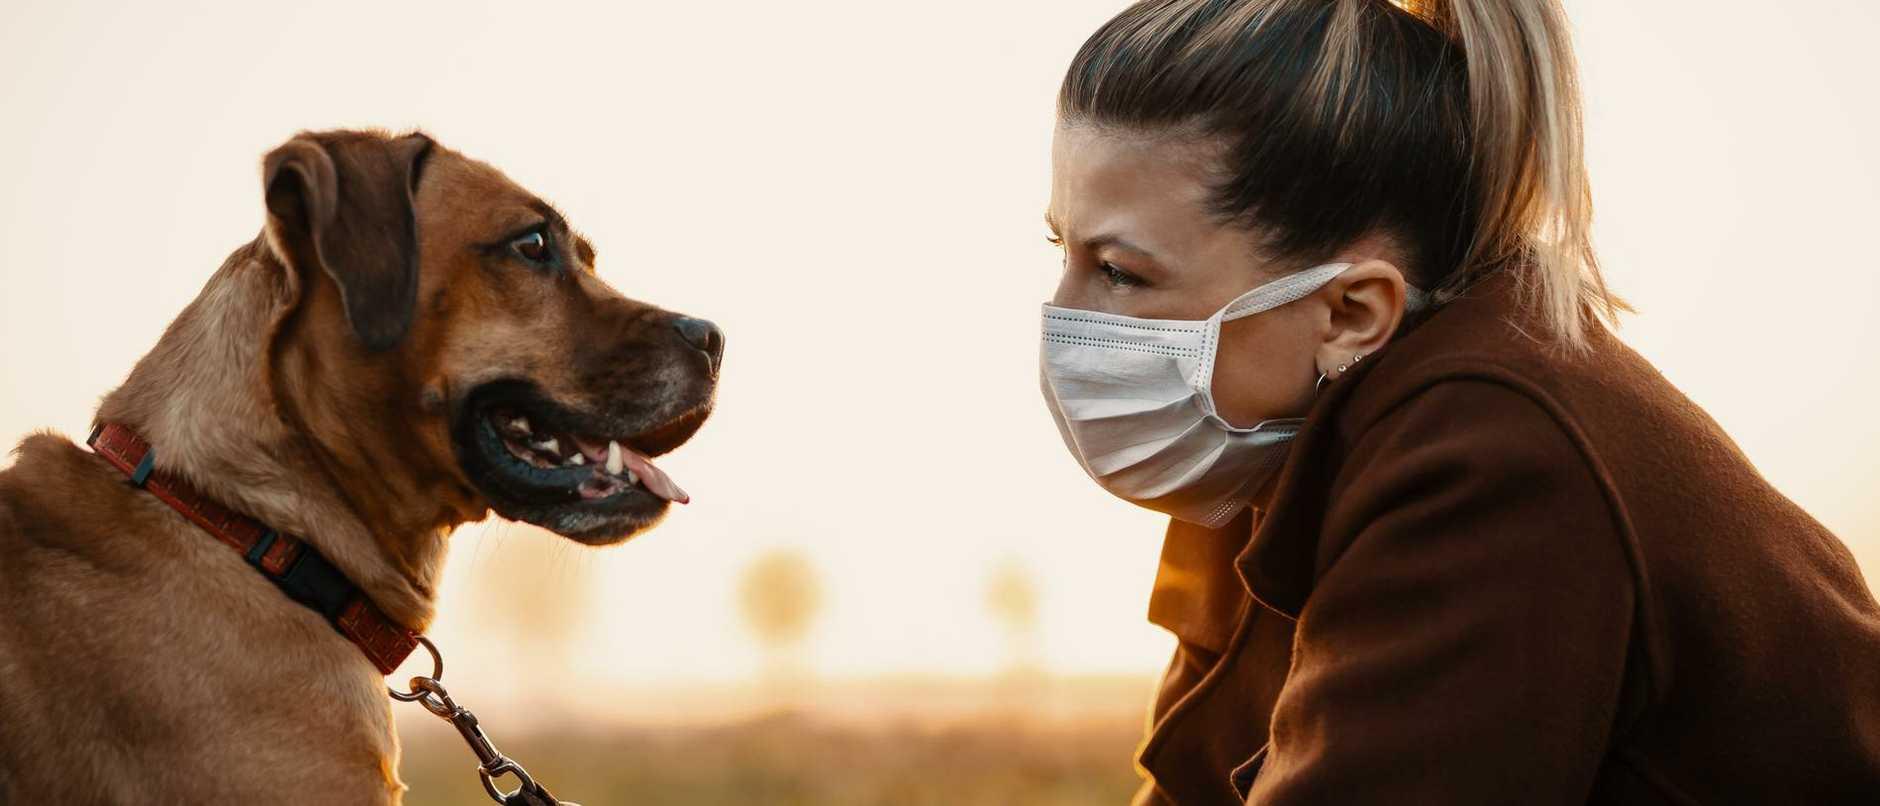 Pet owner corona virus pandemic covid-19